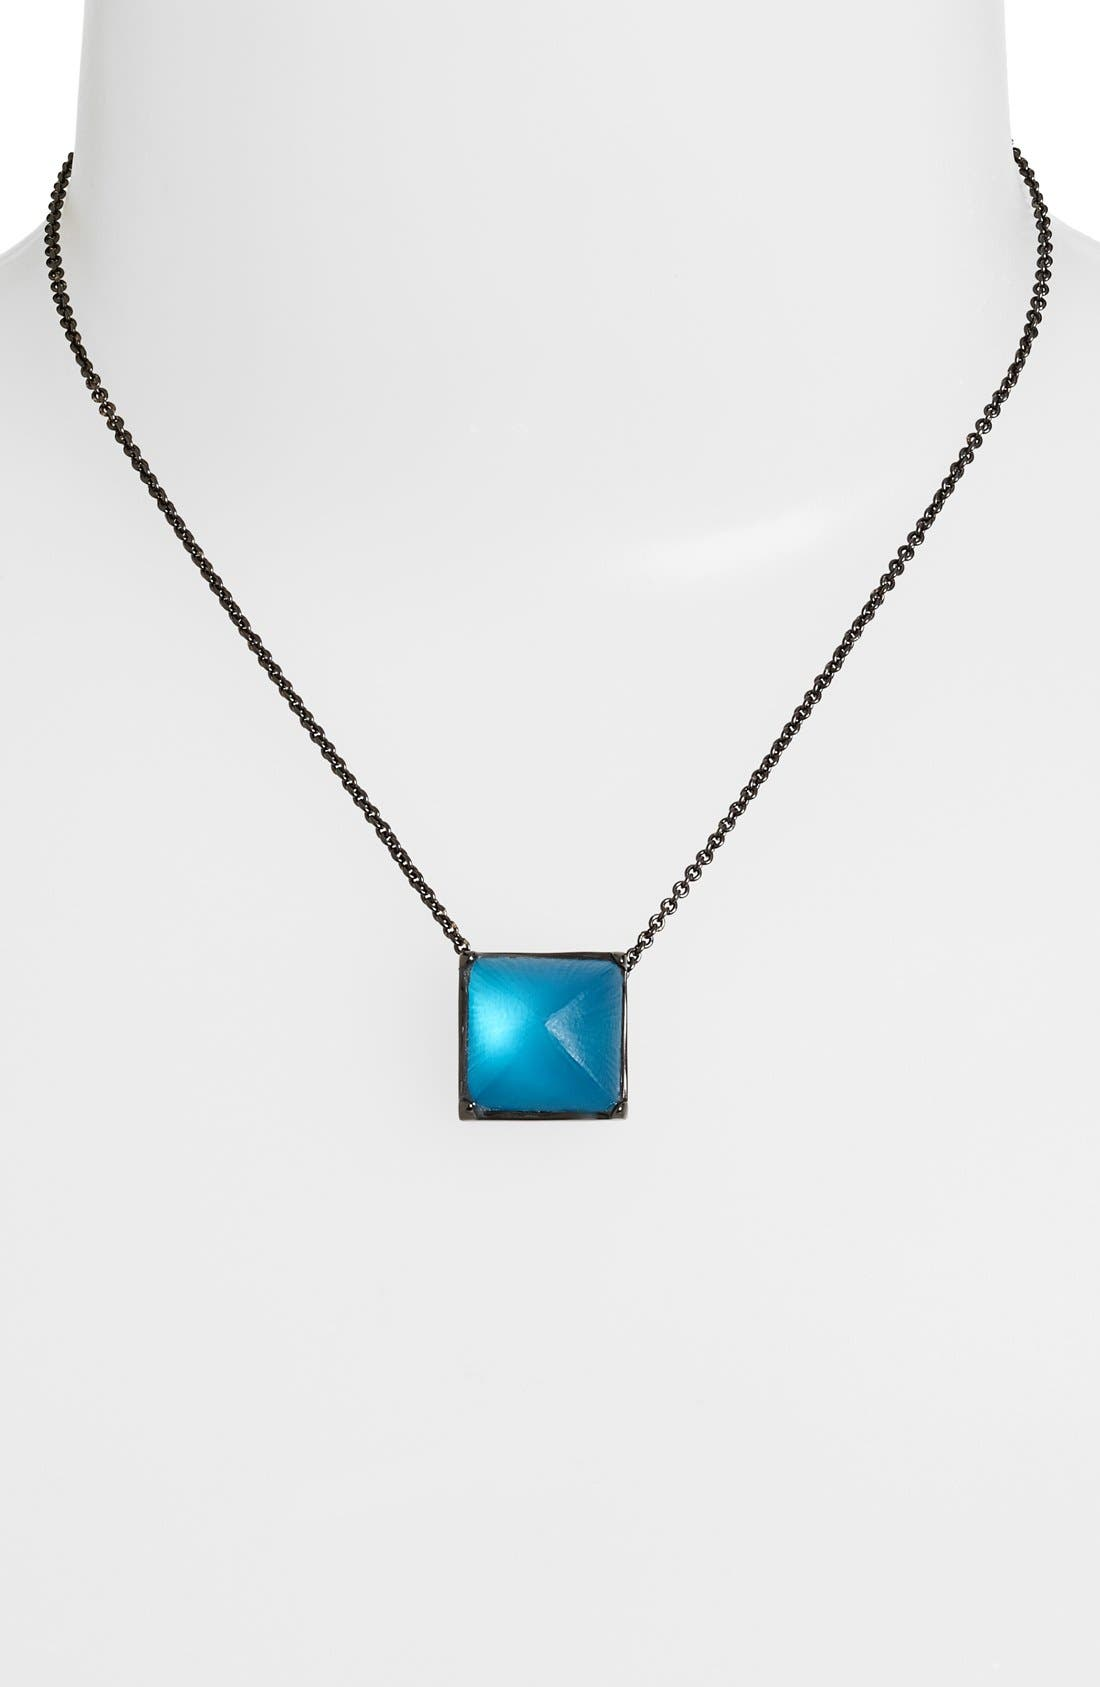 Alternate Image 1 Selected - Alexis Bittar 'Lucite® - Santa Fe Deco' Pyramid Pendant Necklace